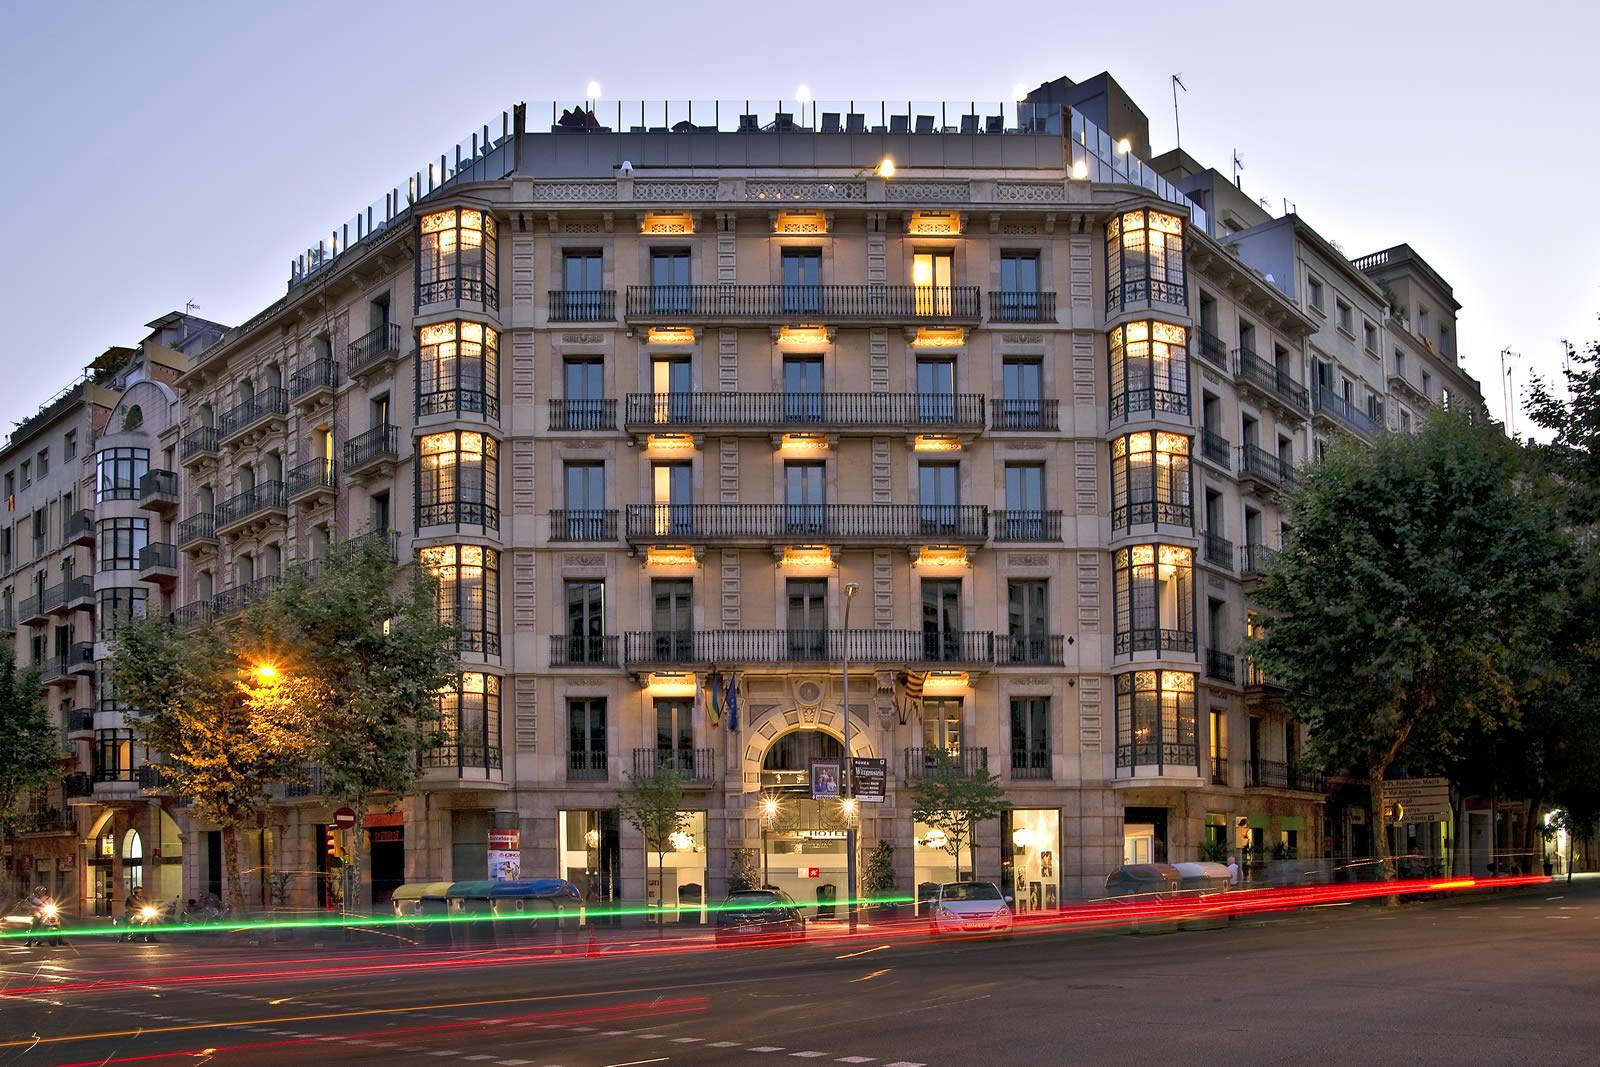 barcelona casino bilder